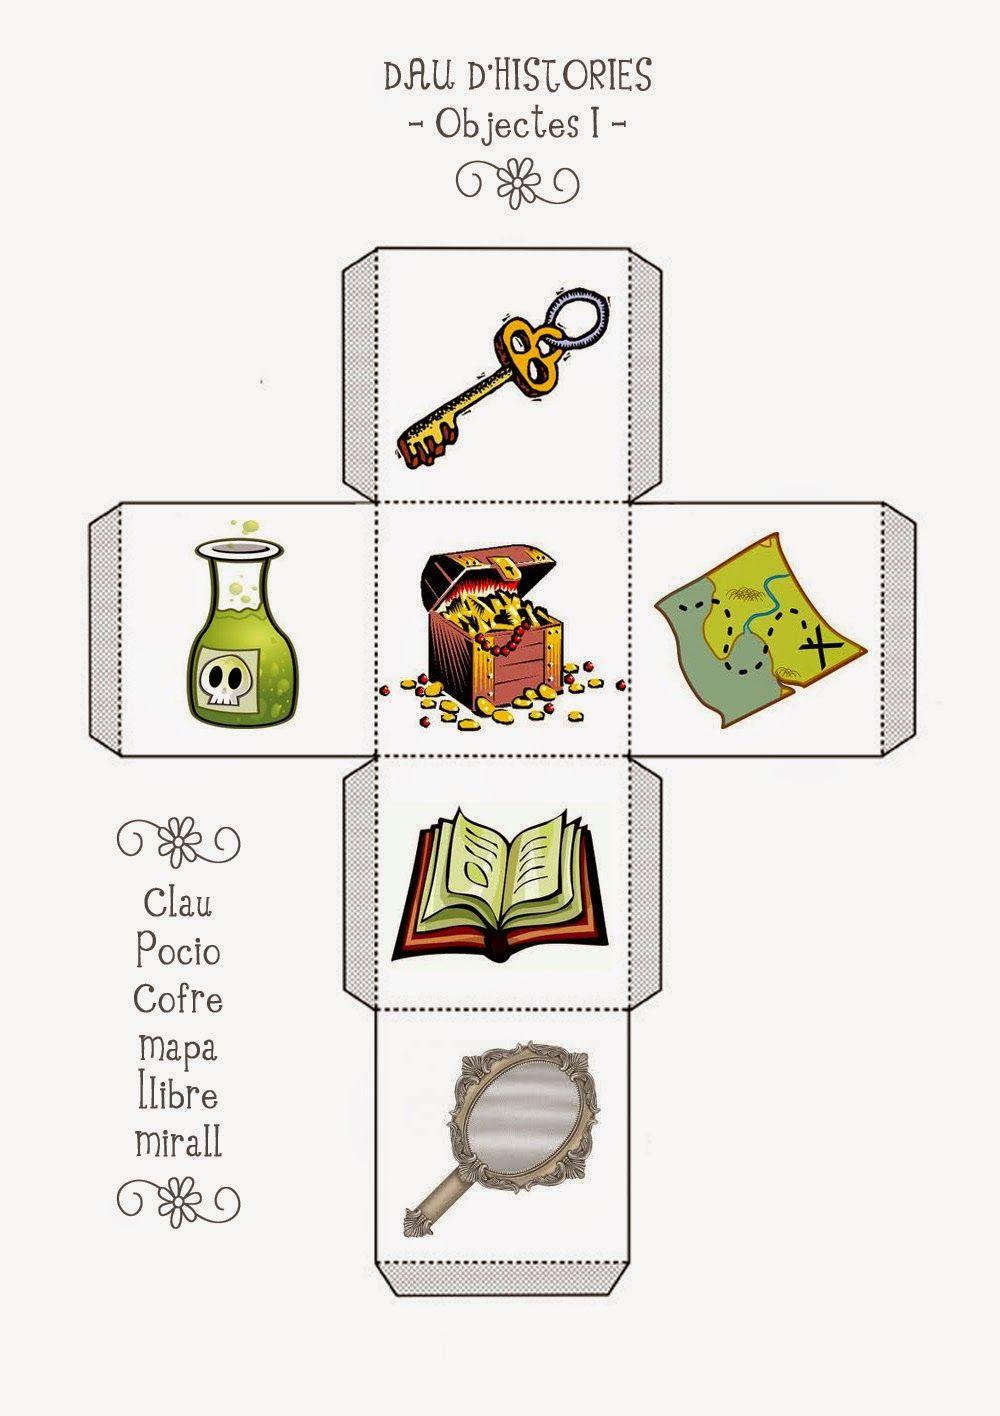 Cubo de histórias3 | Recursos en el aula | Pinterest ...